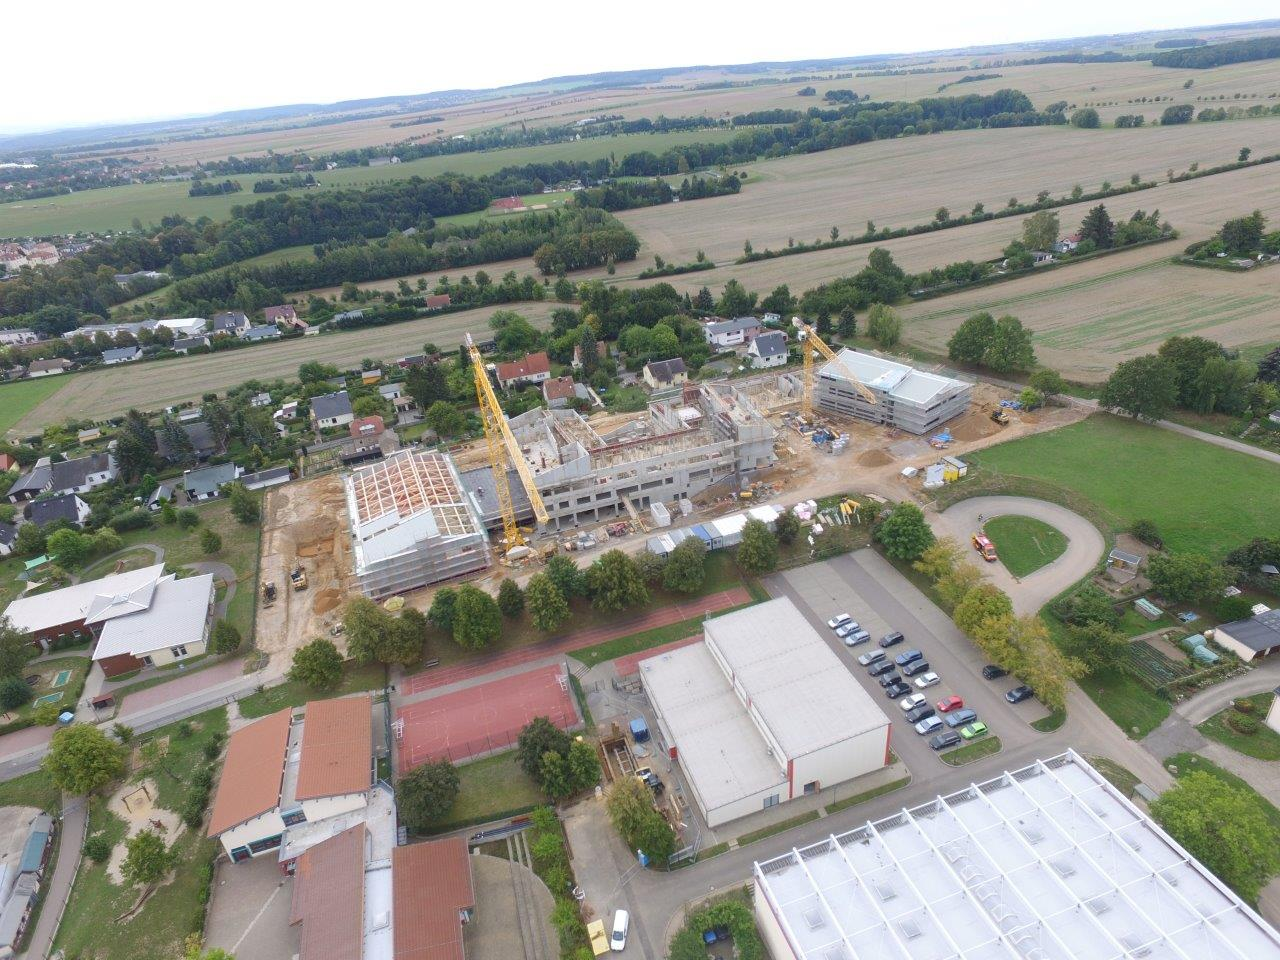 Gymnasium_Drohne_09-2018.JPG